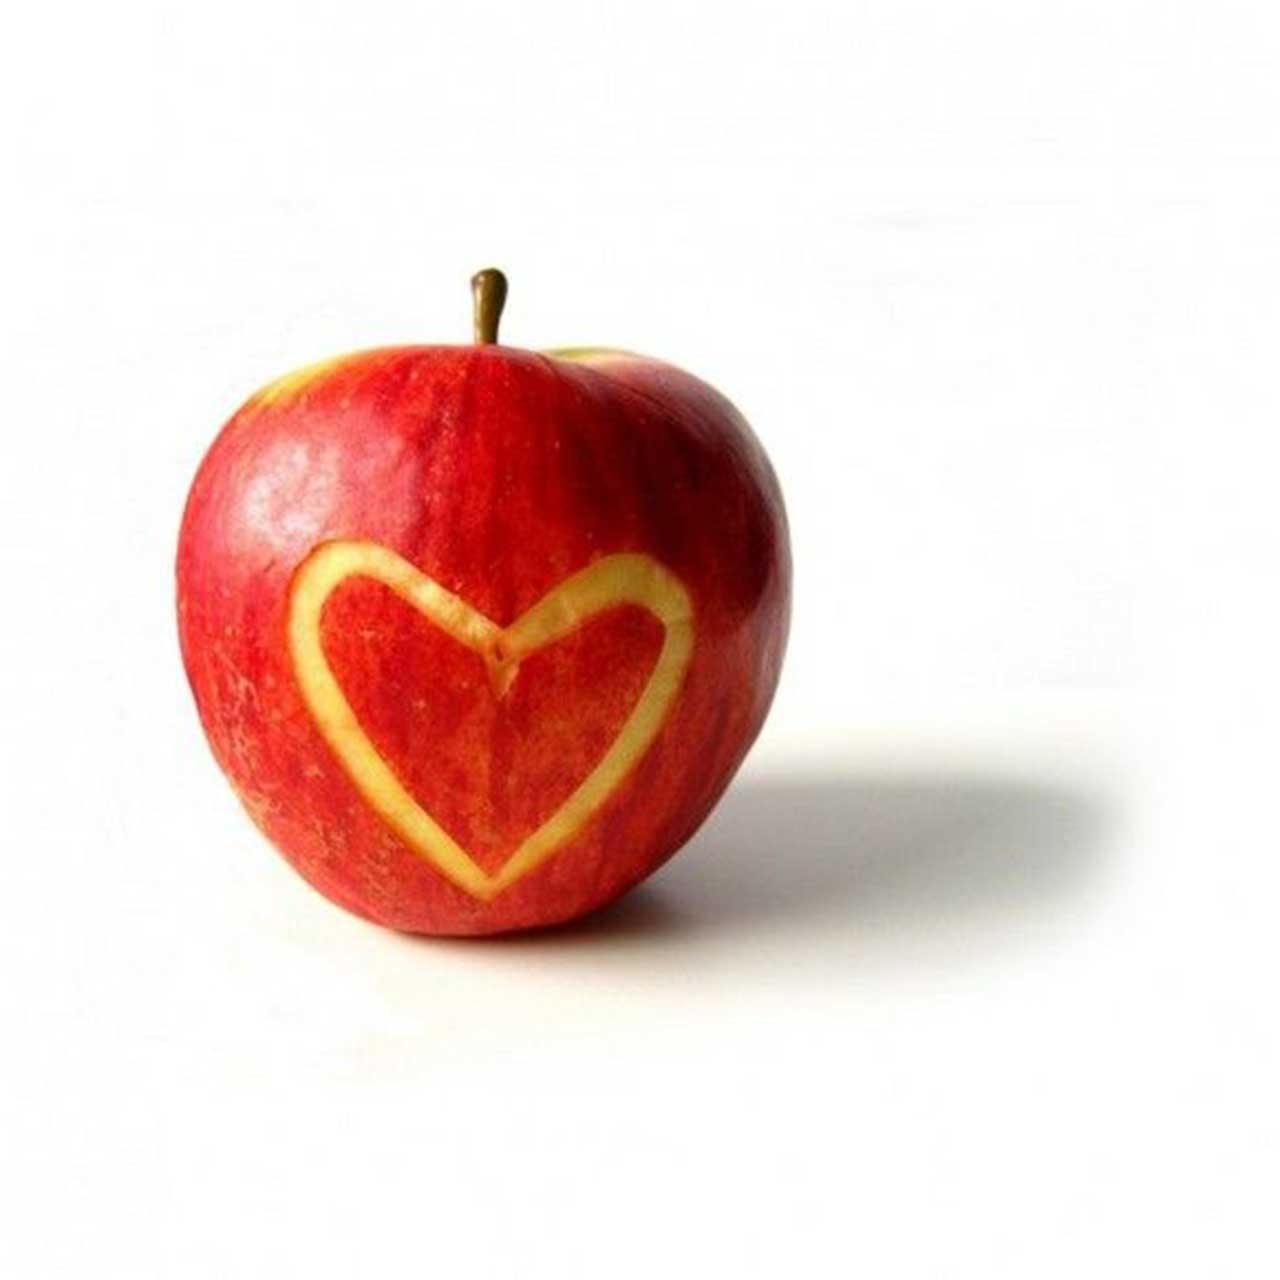 apple heart wallpaper